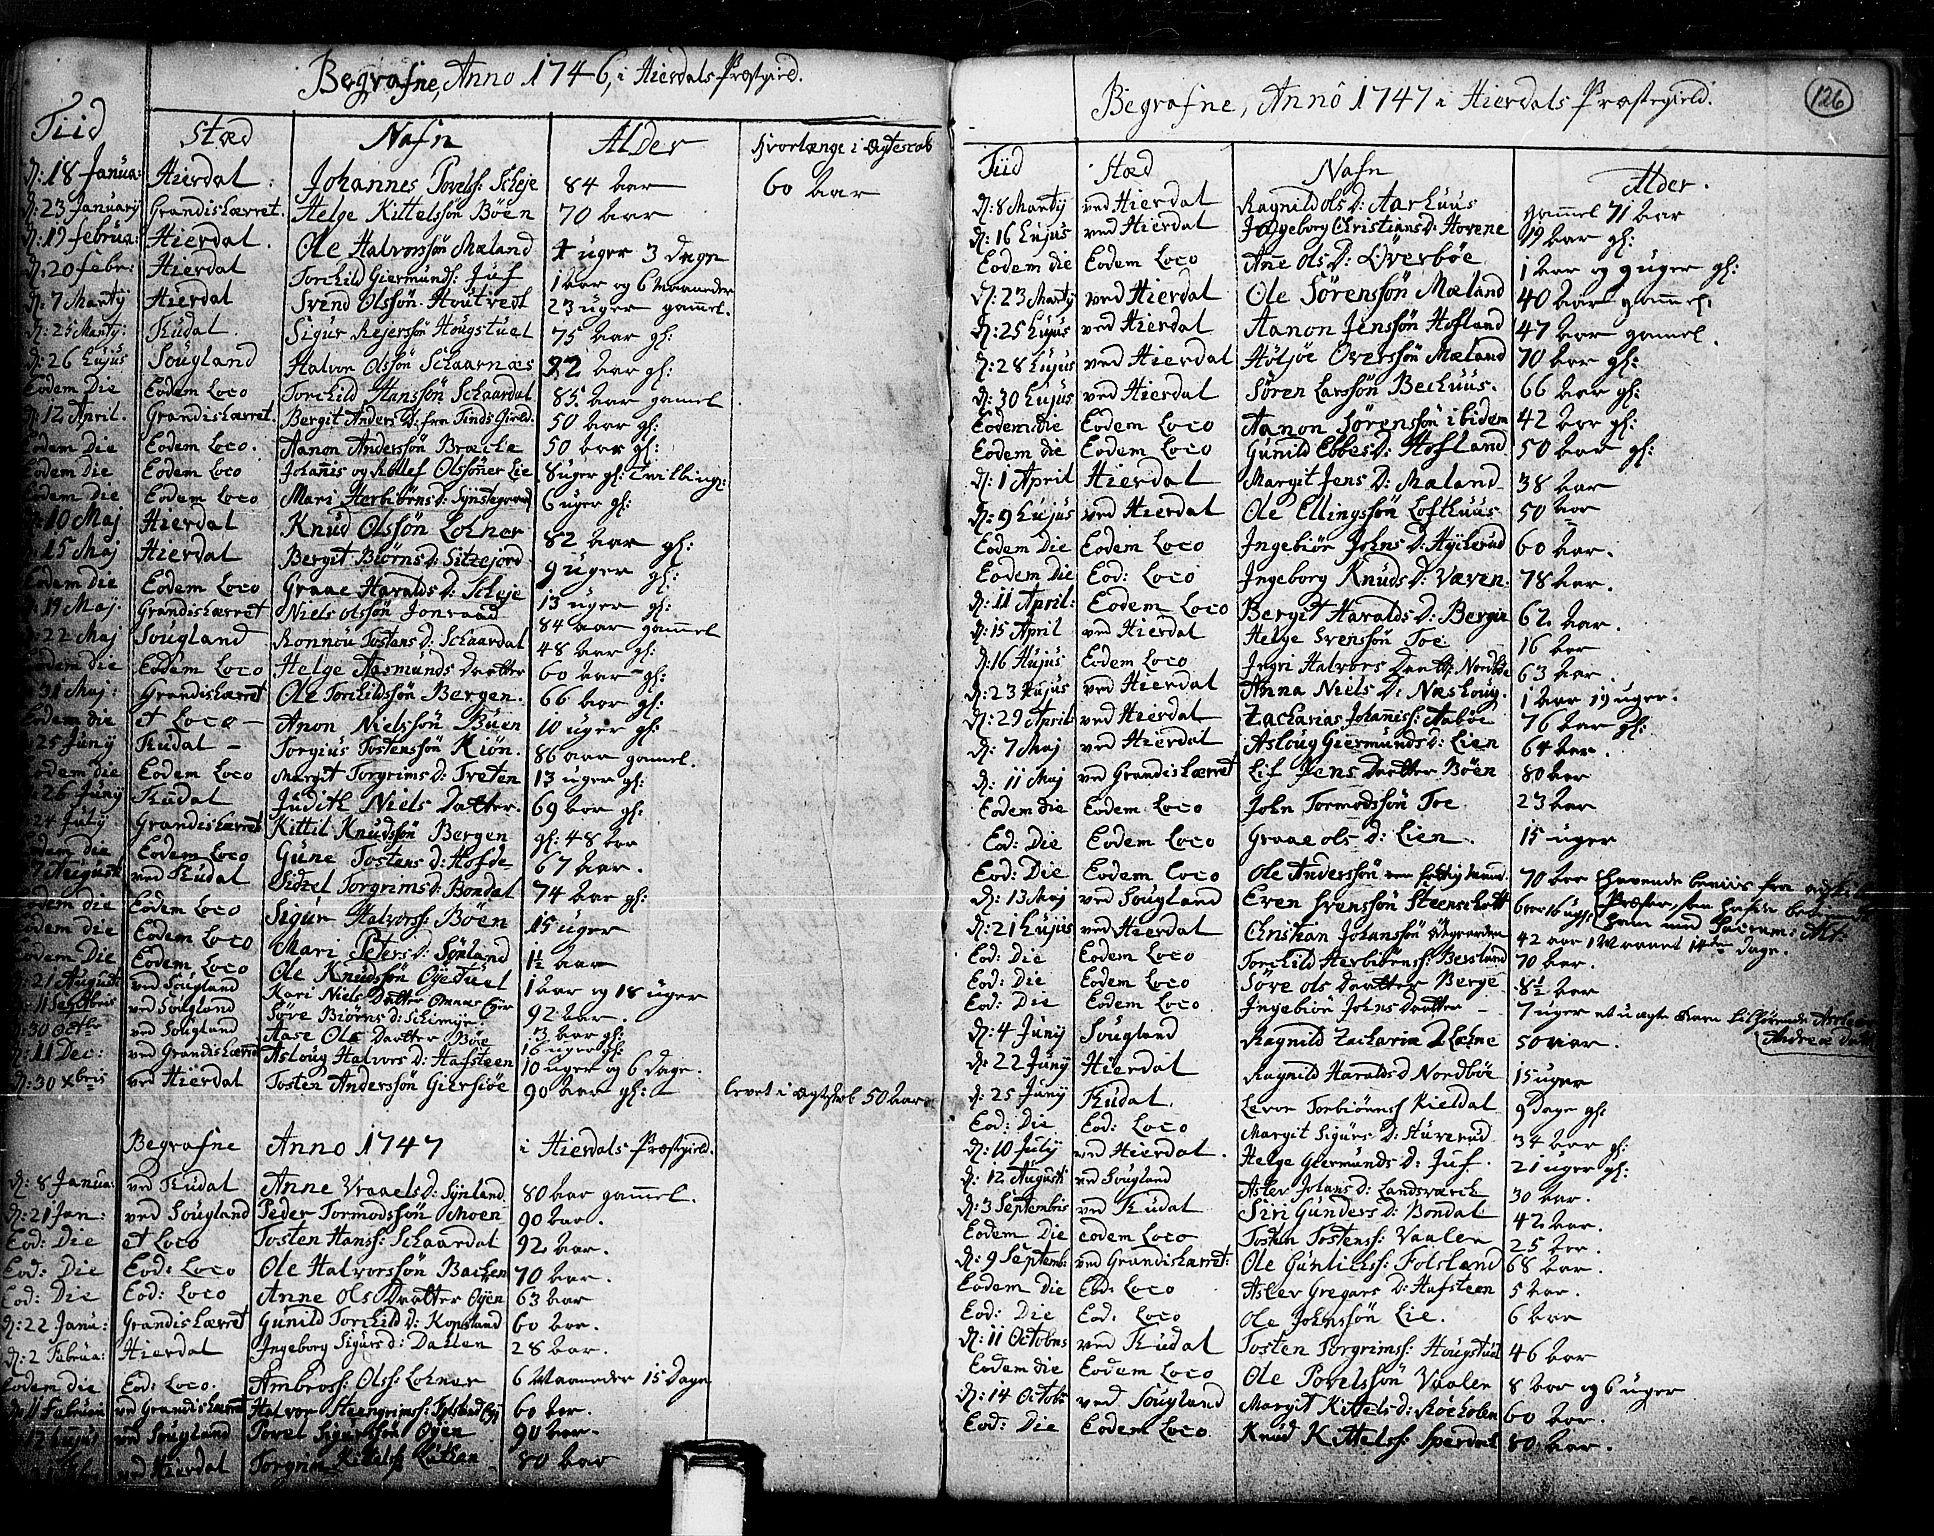 SAKO, Hjartdal kirkebøker, F/Fa/L0003: Ministerialbok nr. I 3, 1727-1775, s. 126